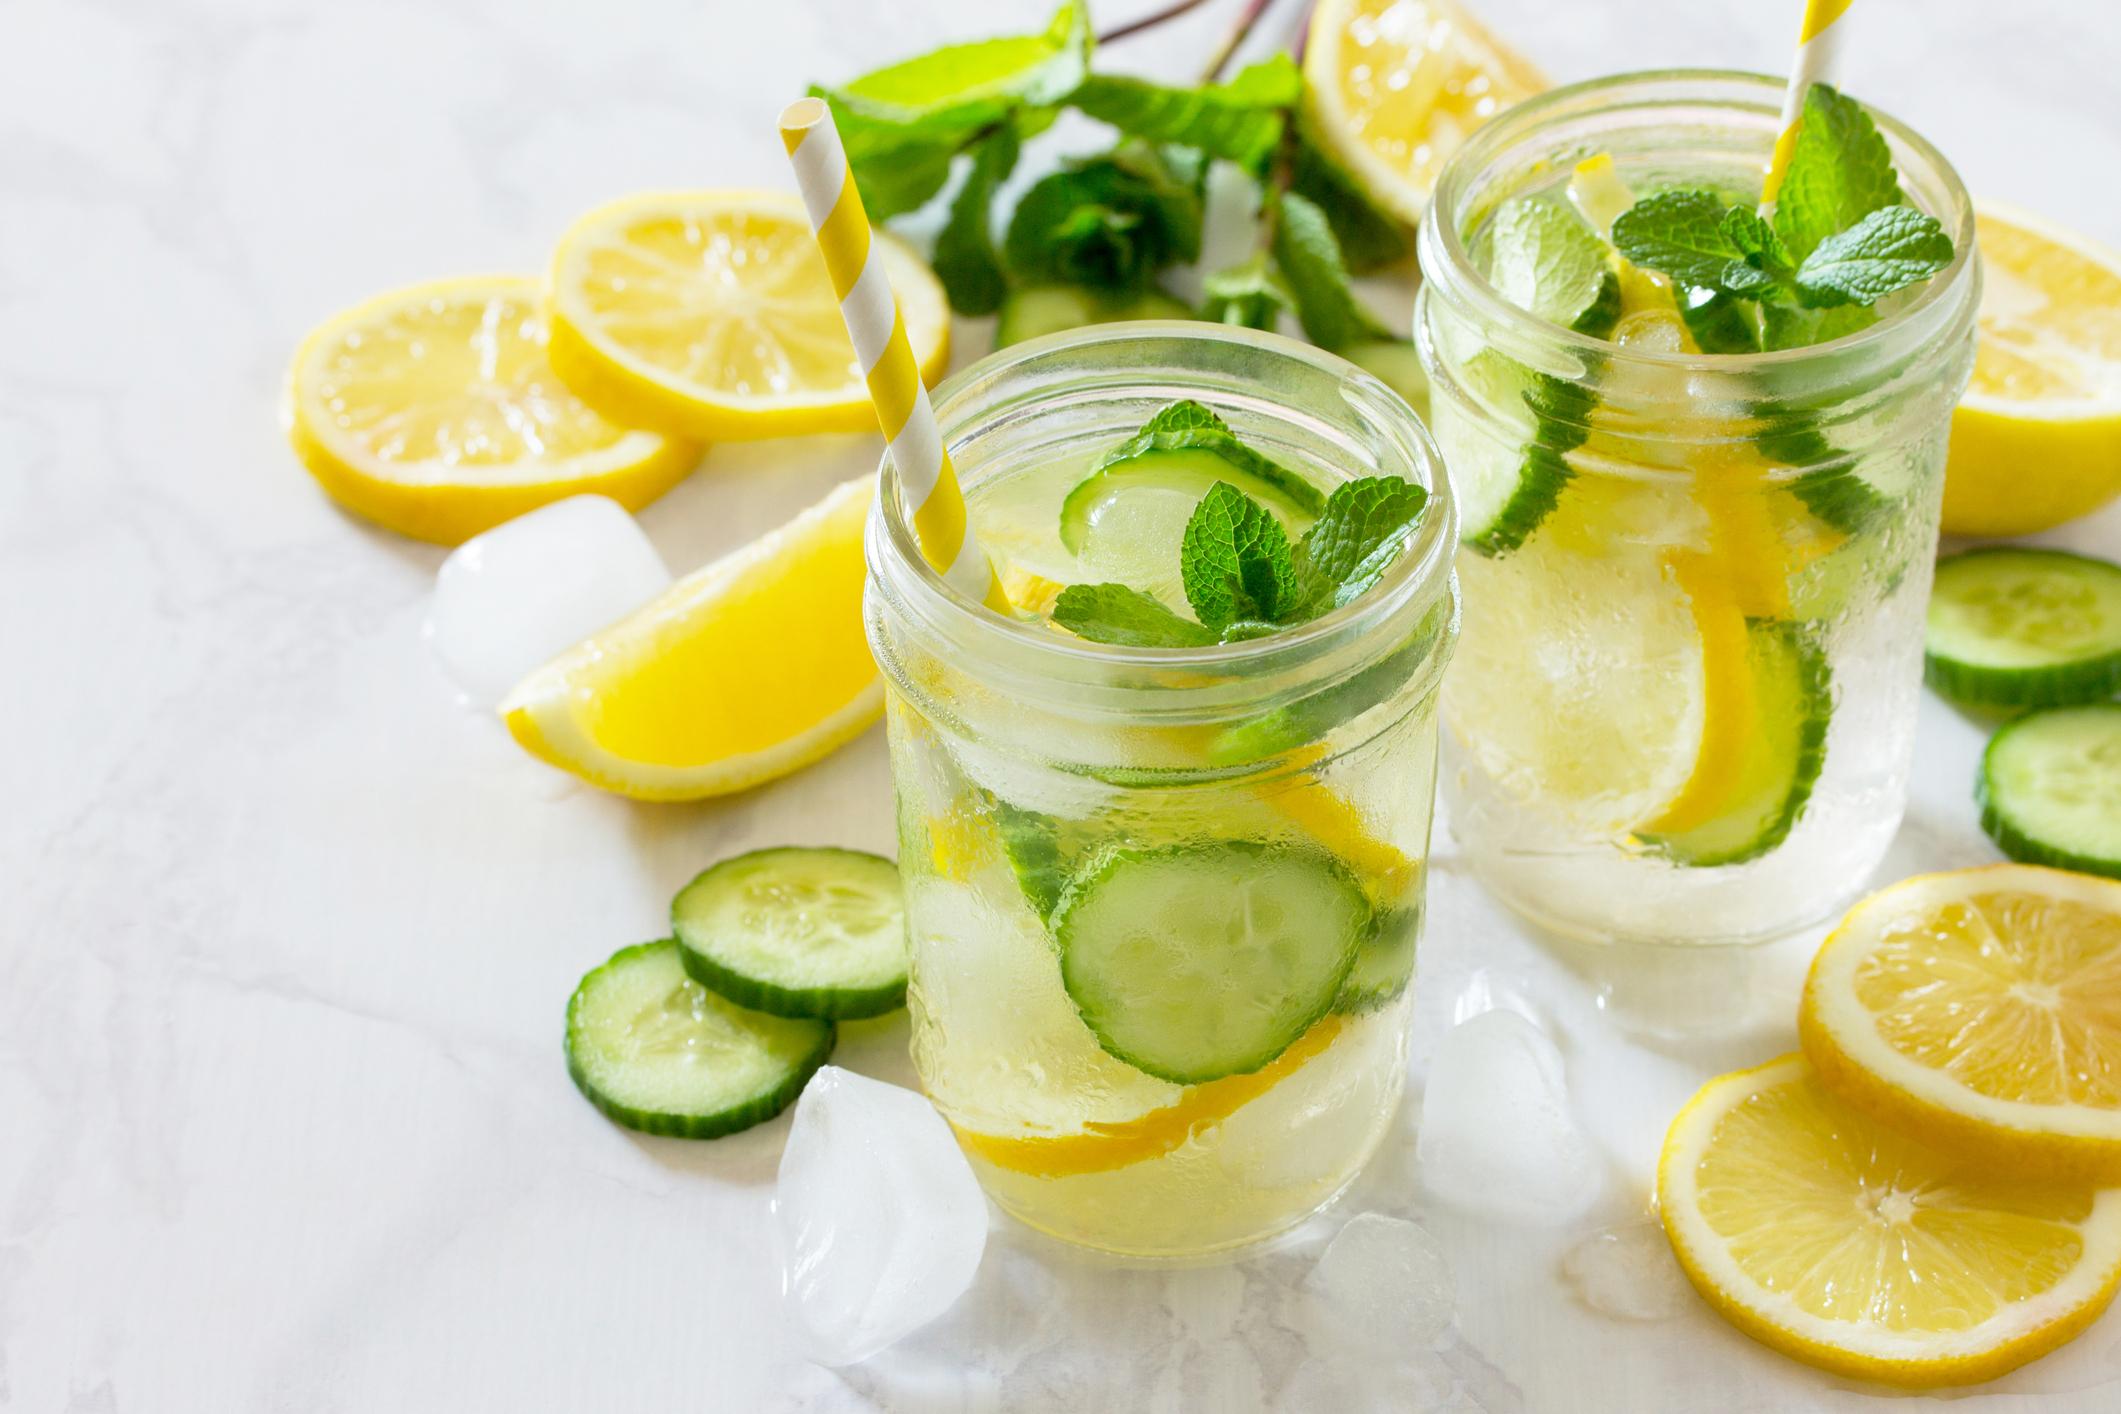 Medicinas naturales para perder peso